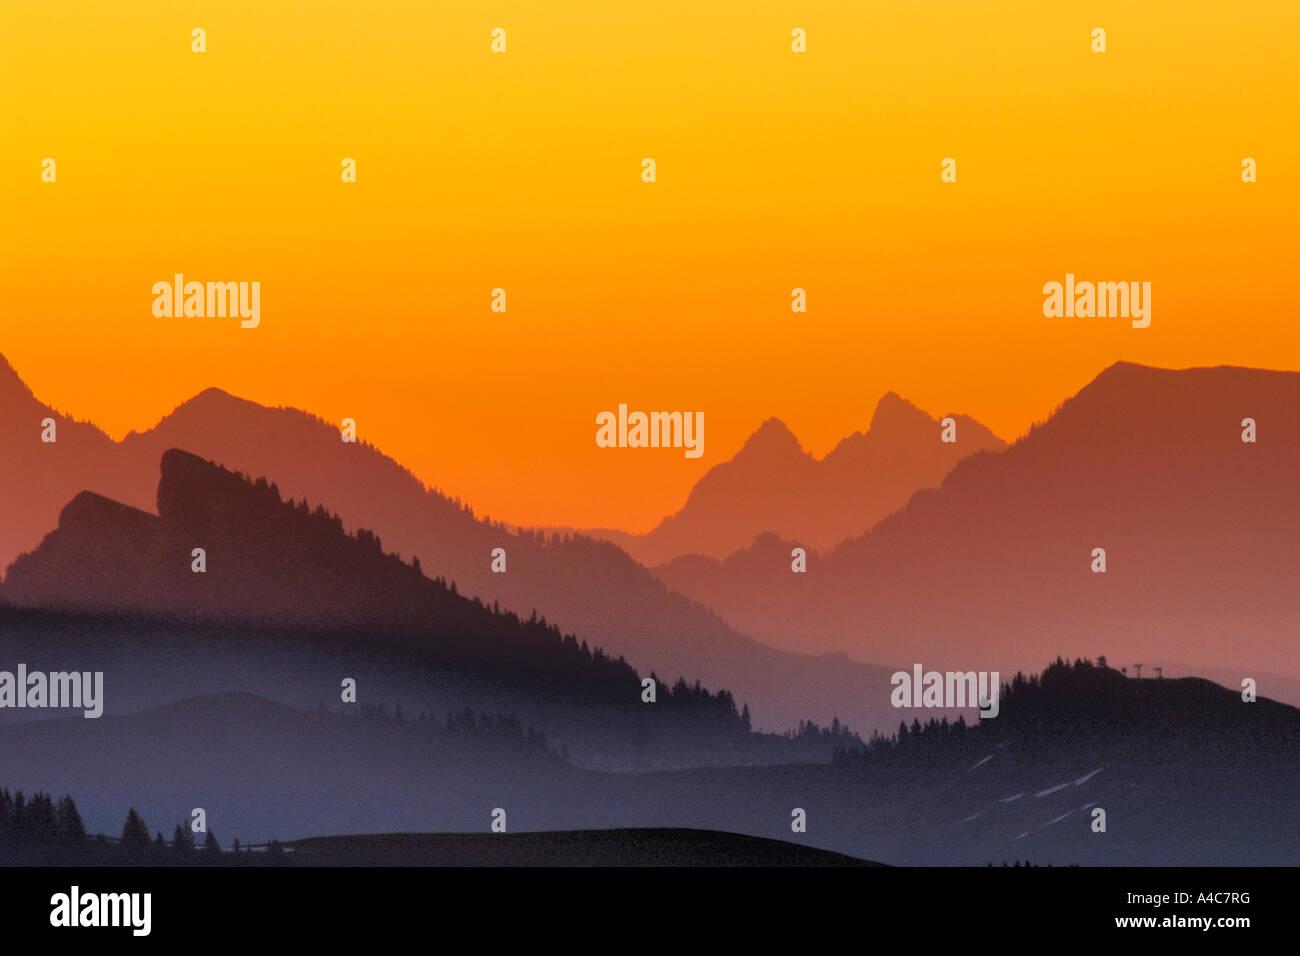 Sonnenaufgang in den Alpen. Schweiz Bern, Berner Oberland, August Stockbild